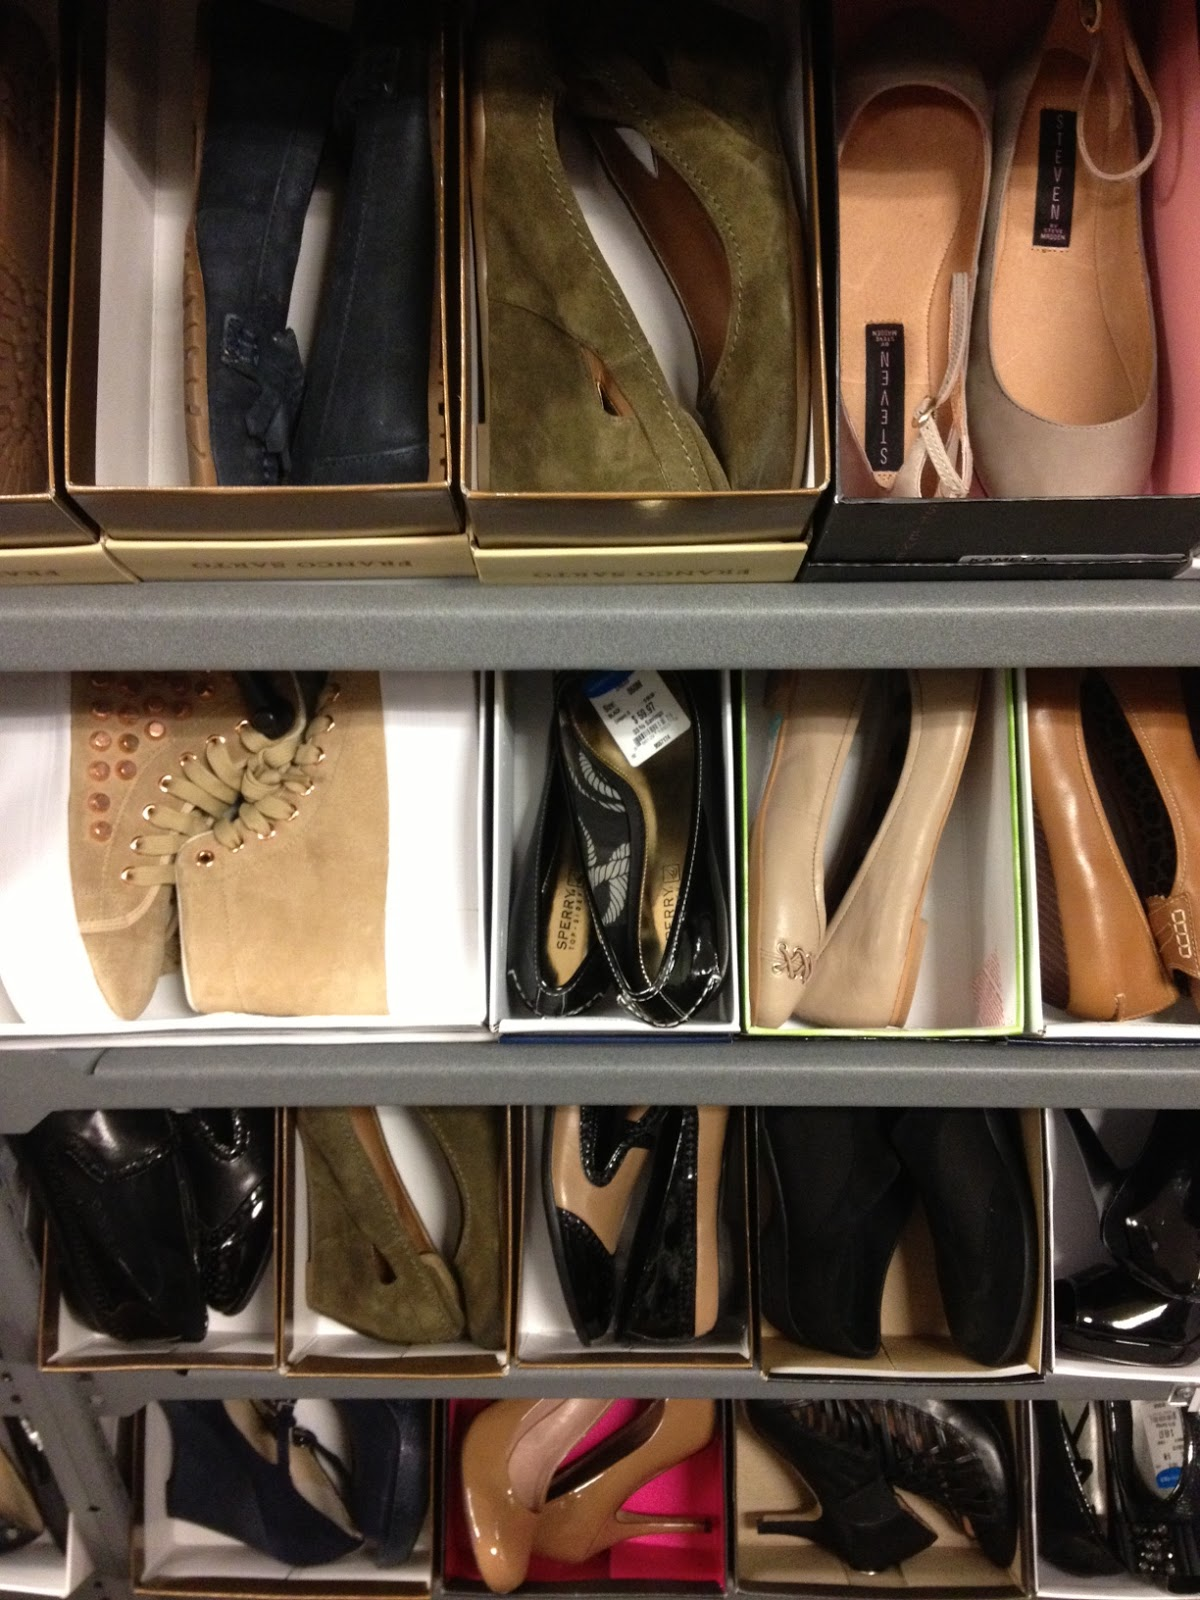 ... fashion freshjess com seattle nordstrom nordstrom rack at northgate